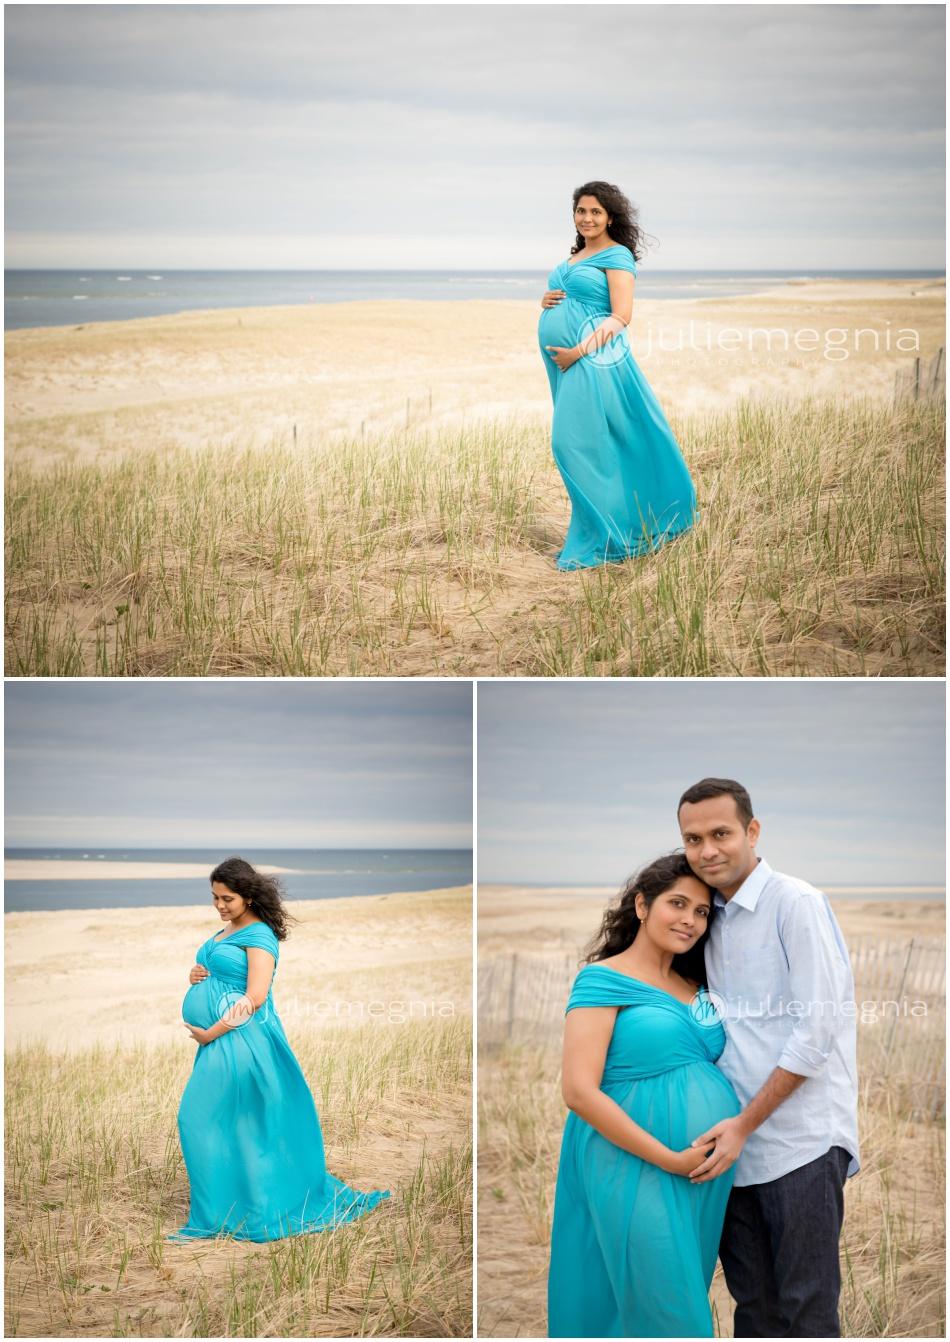 Chatham Beach Maternity Portraits_Peacock Blue Dress_Julie Megnia Photography